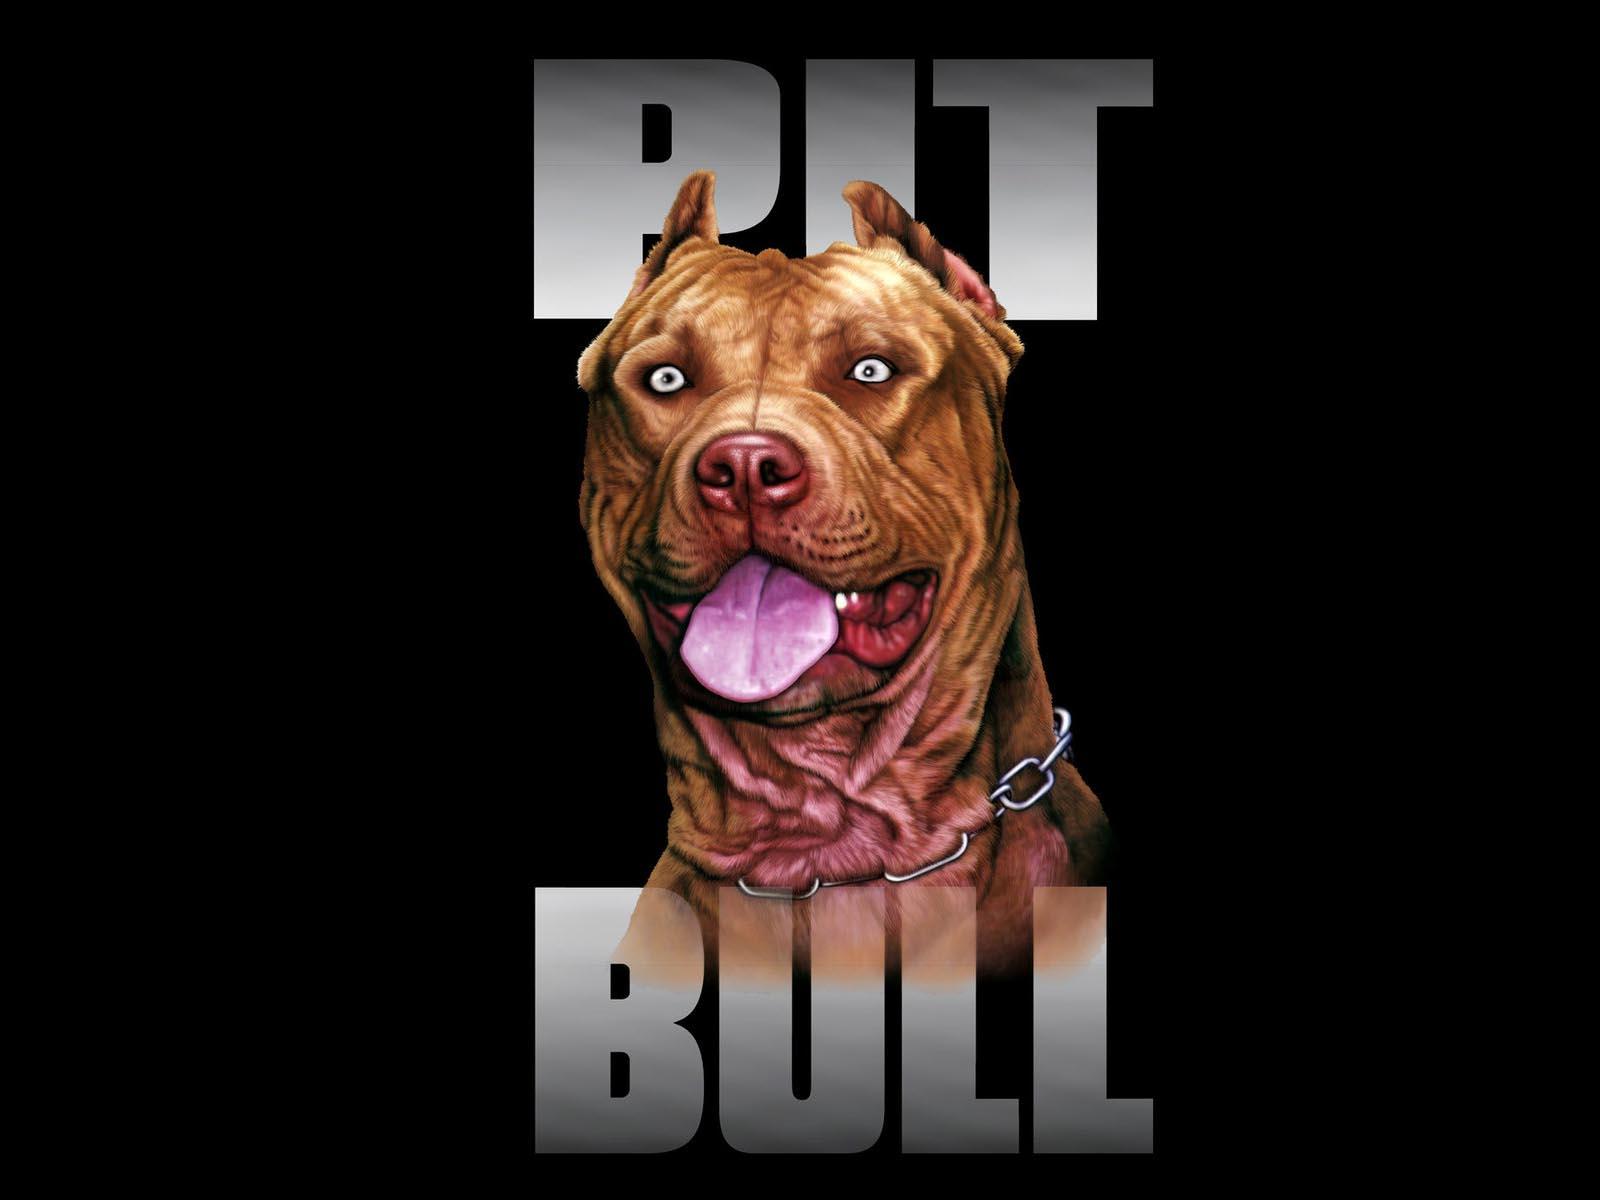 Pitbull Wallpaper HD - WallpaperSafari